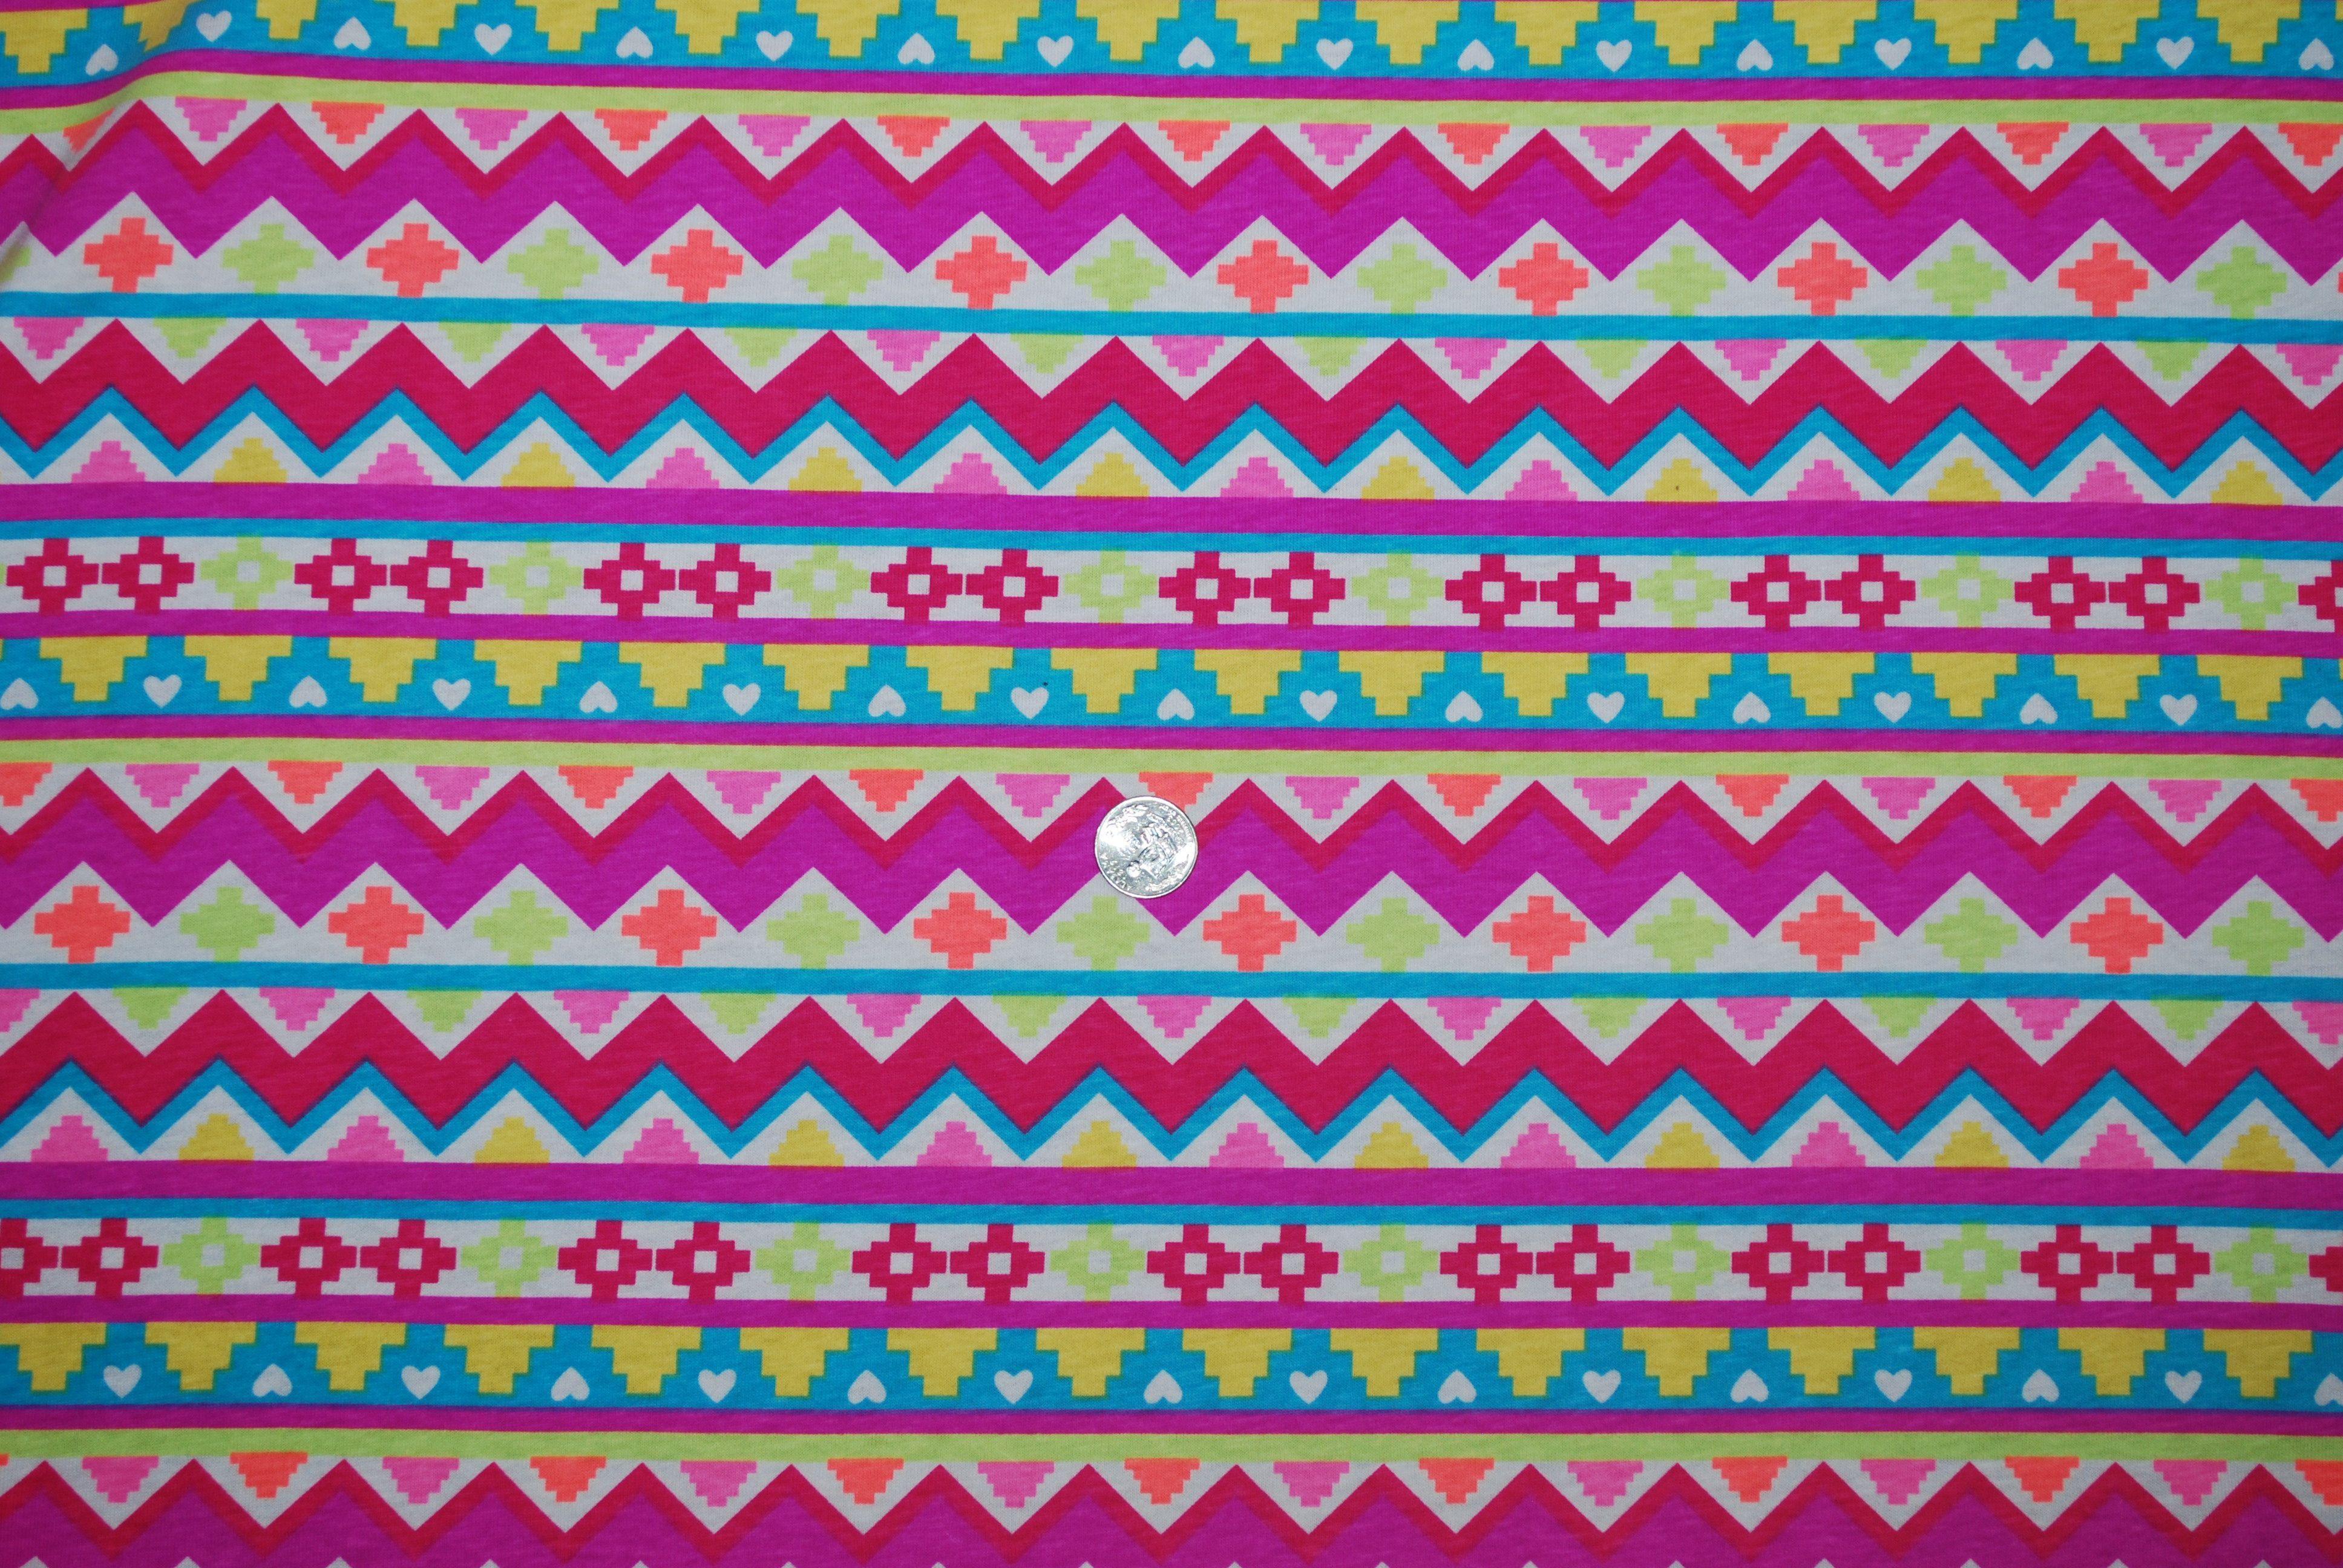 Tribal Pattern Wallpapers 3872x2592